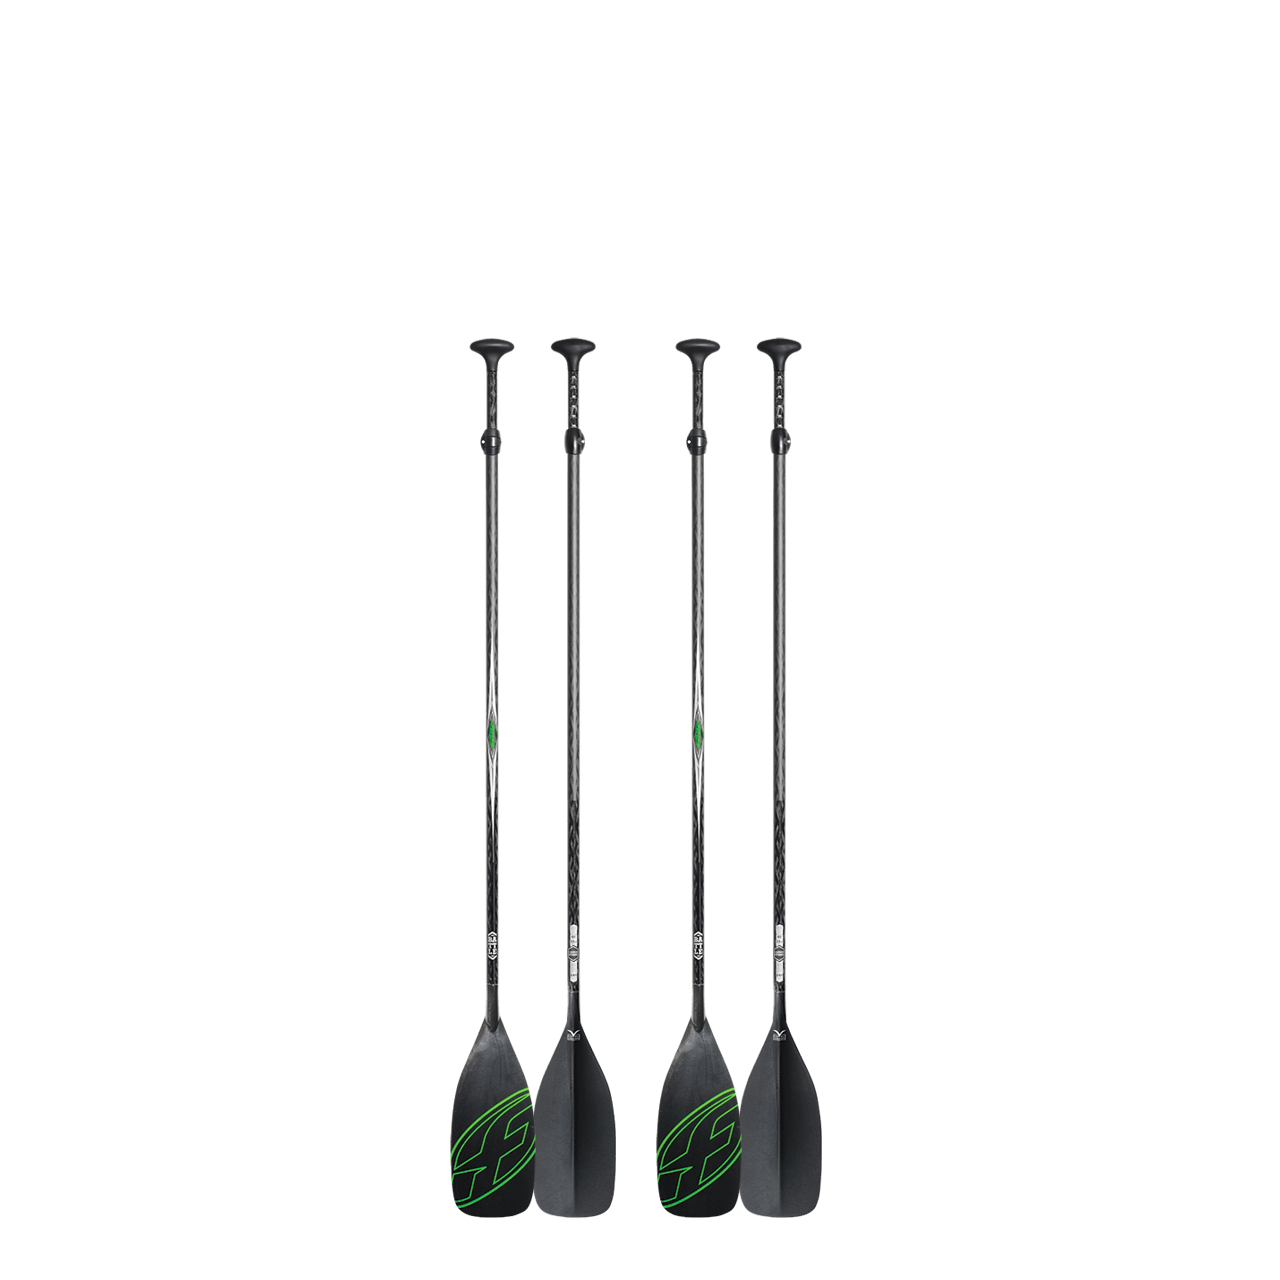 BATTLE Carbon Hybrid Vario